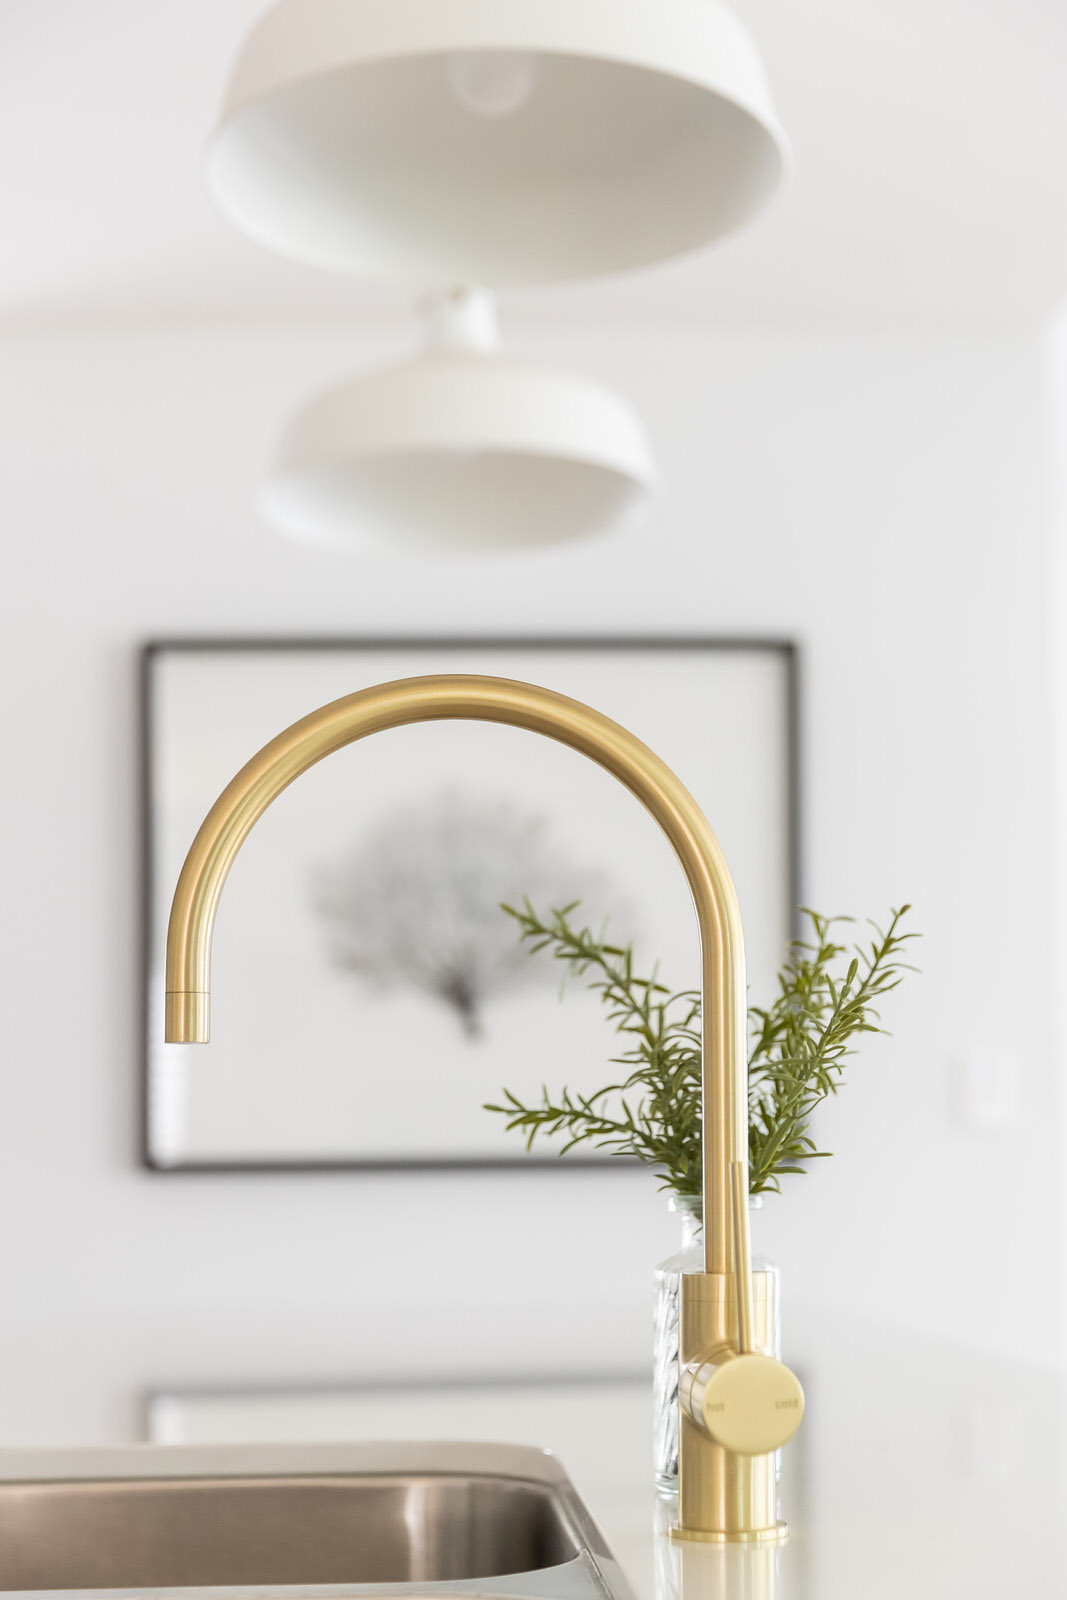 Ammon_Creative-Interior_Photography-Real_Estate-Hatch_Interiors-0023.jpg